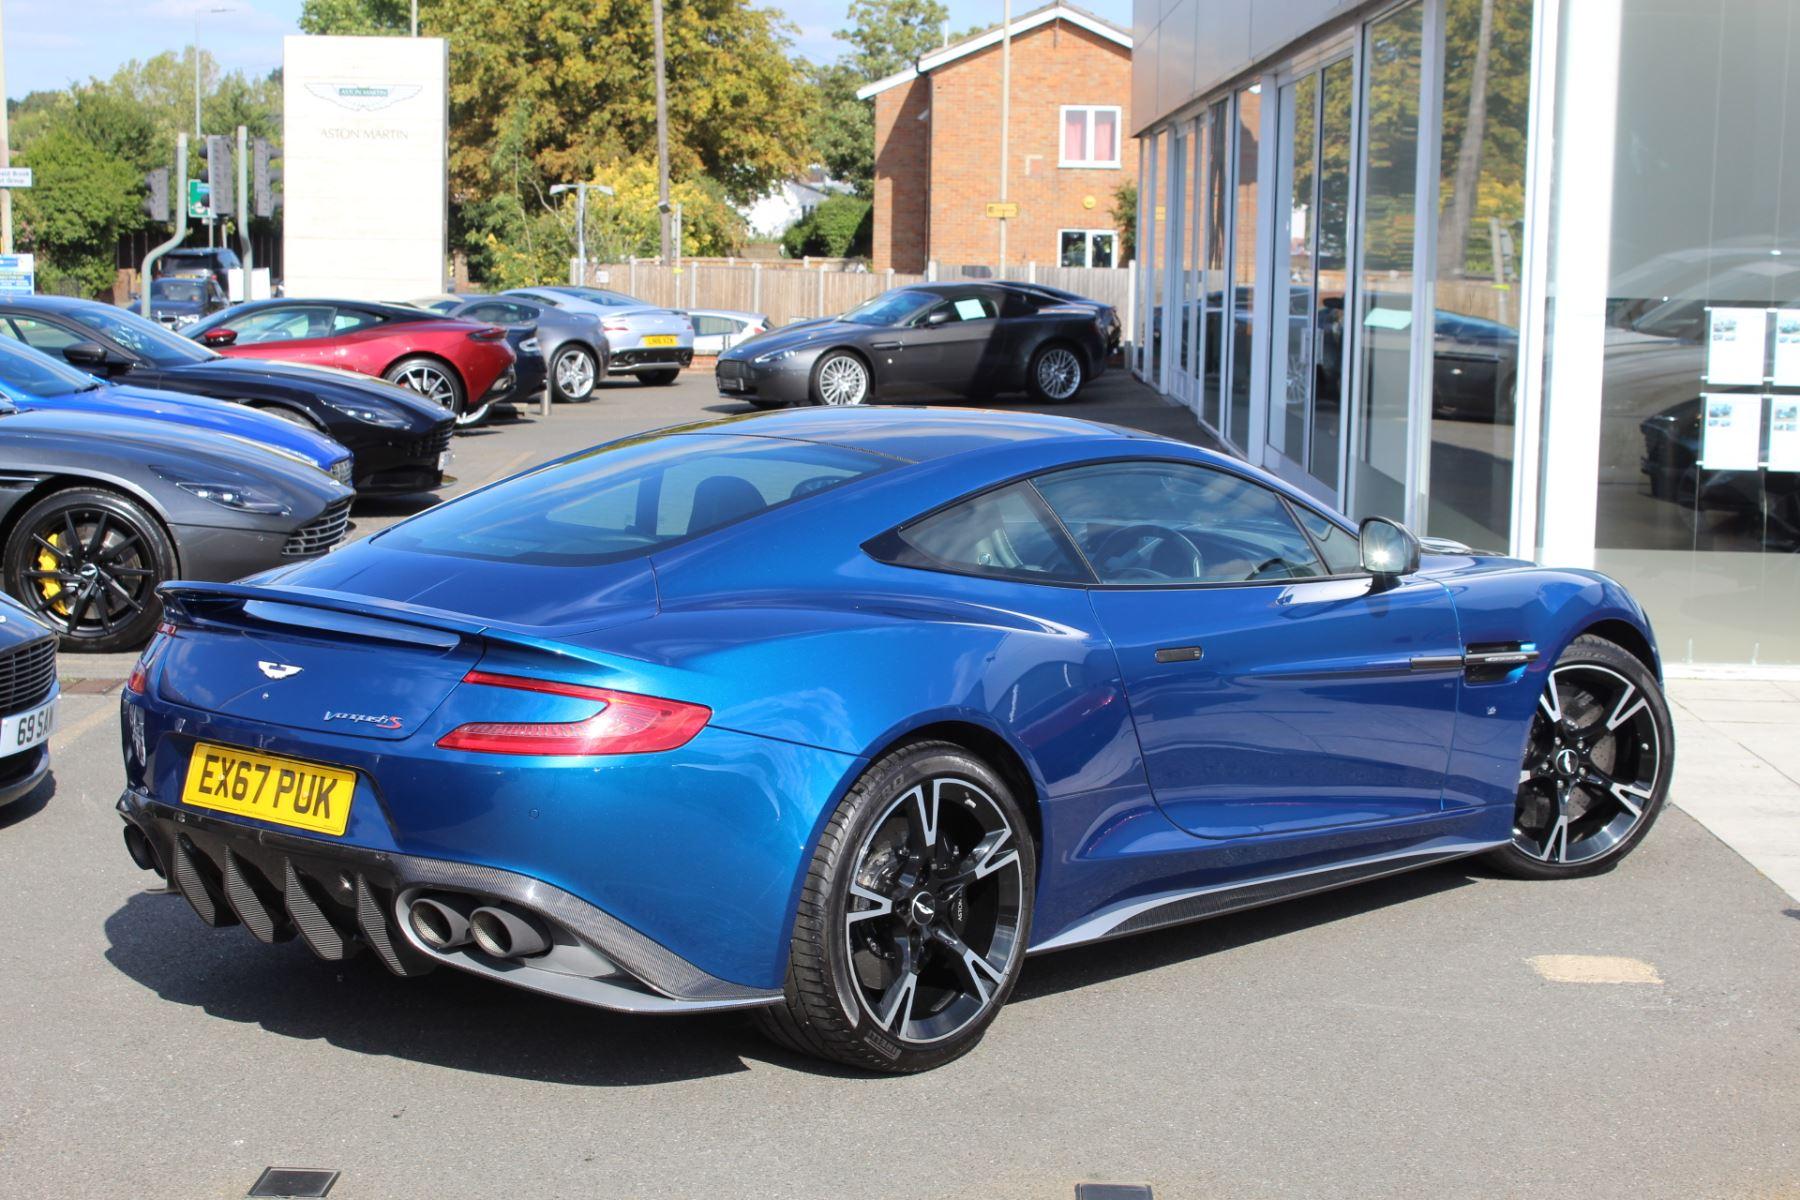 Aston Martin Vanquish V12 [595] S 2+2 2dr Touchtronic image 10